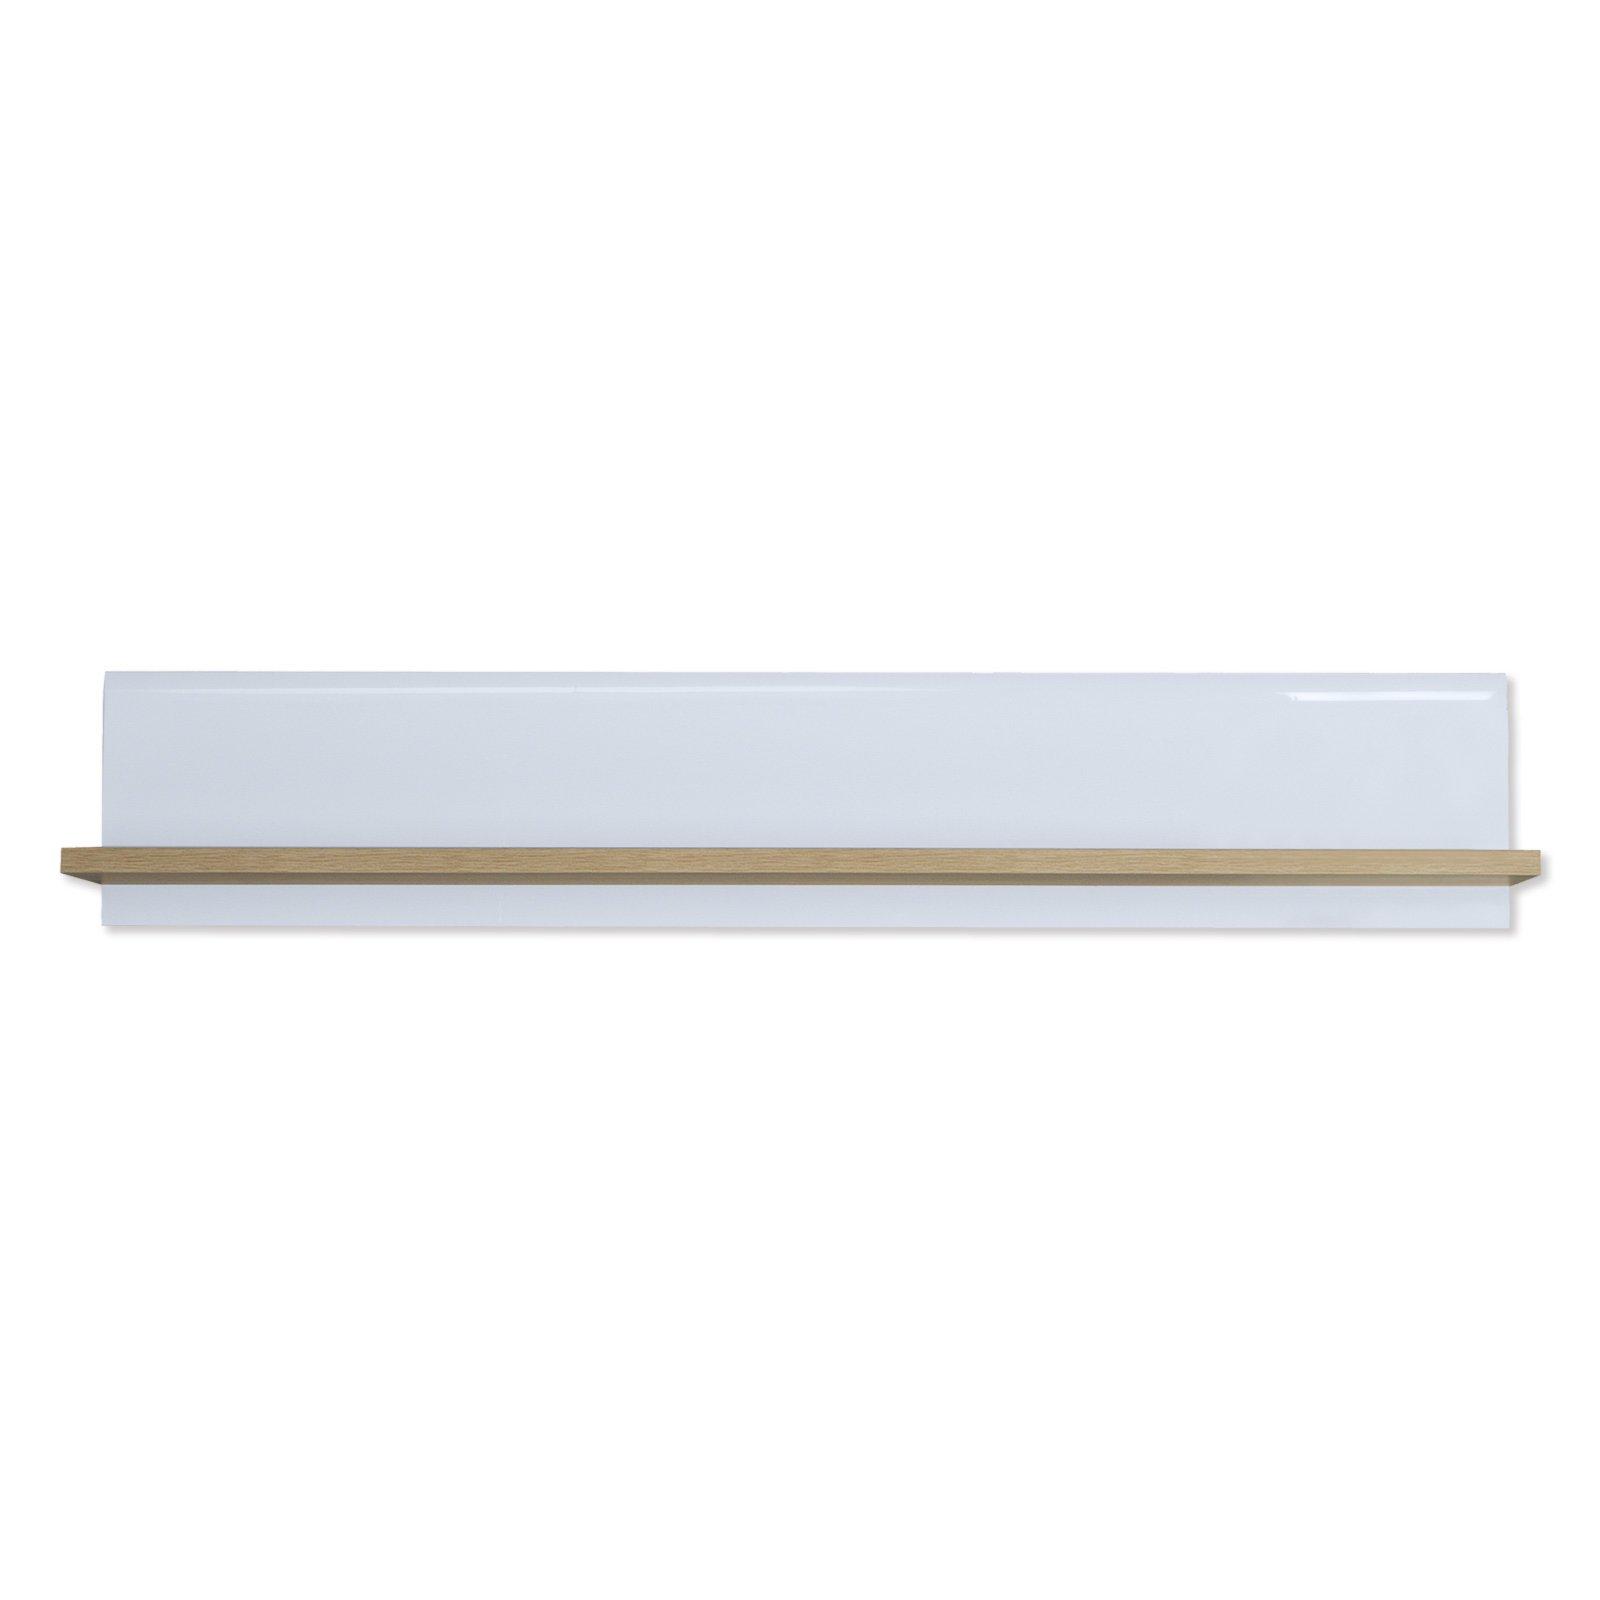 wandboard tiziano sonoma eiche wei hochglanz 144 cm. Black Bedroom Furniture Sets. Home Design Ideas